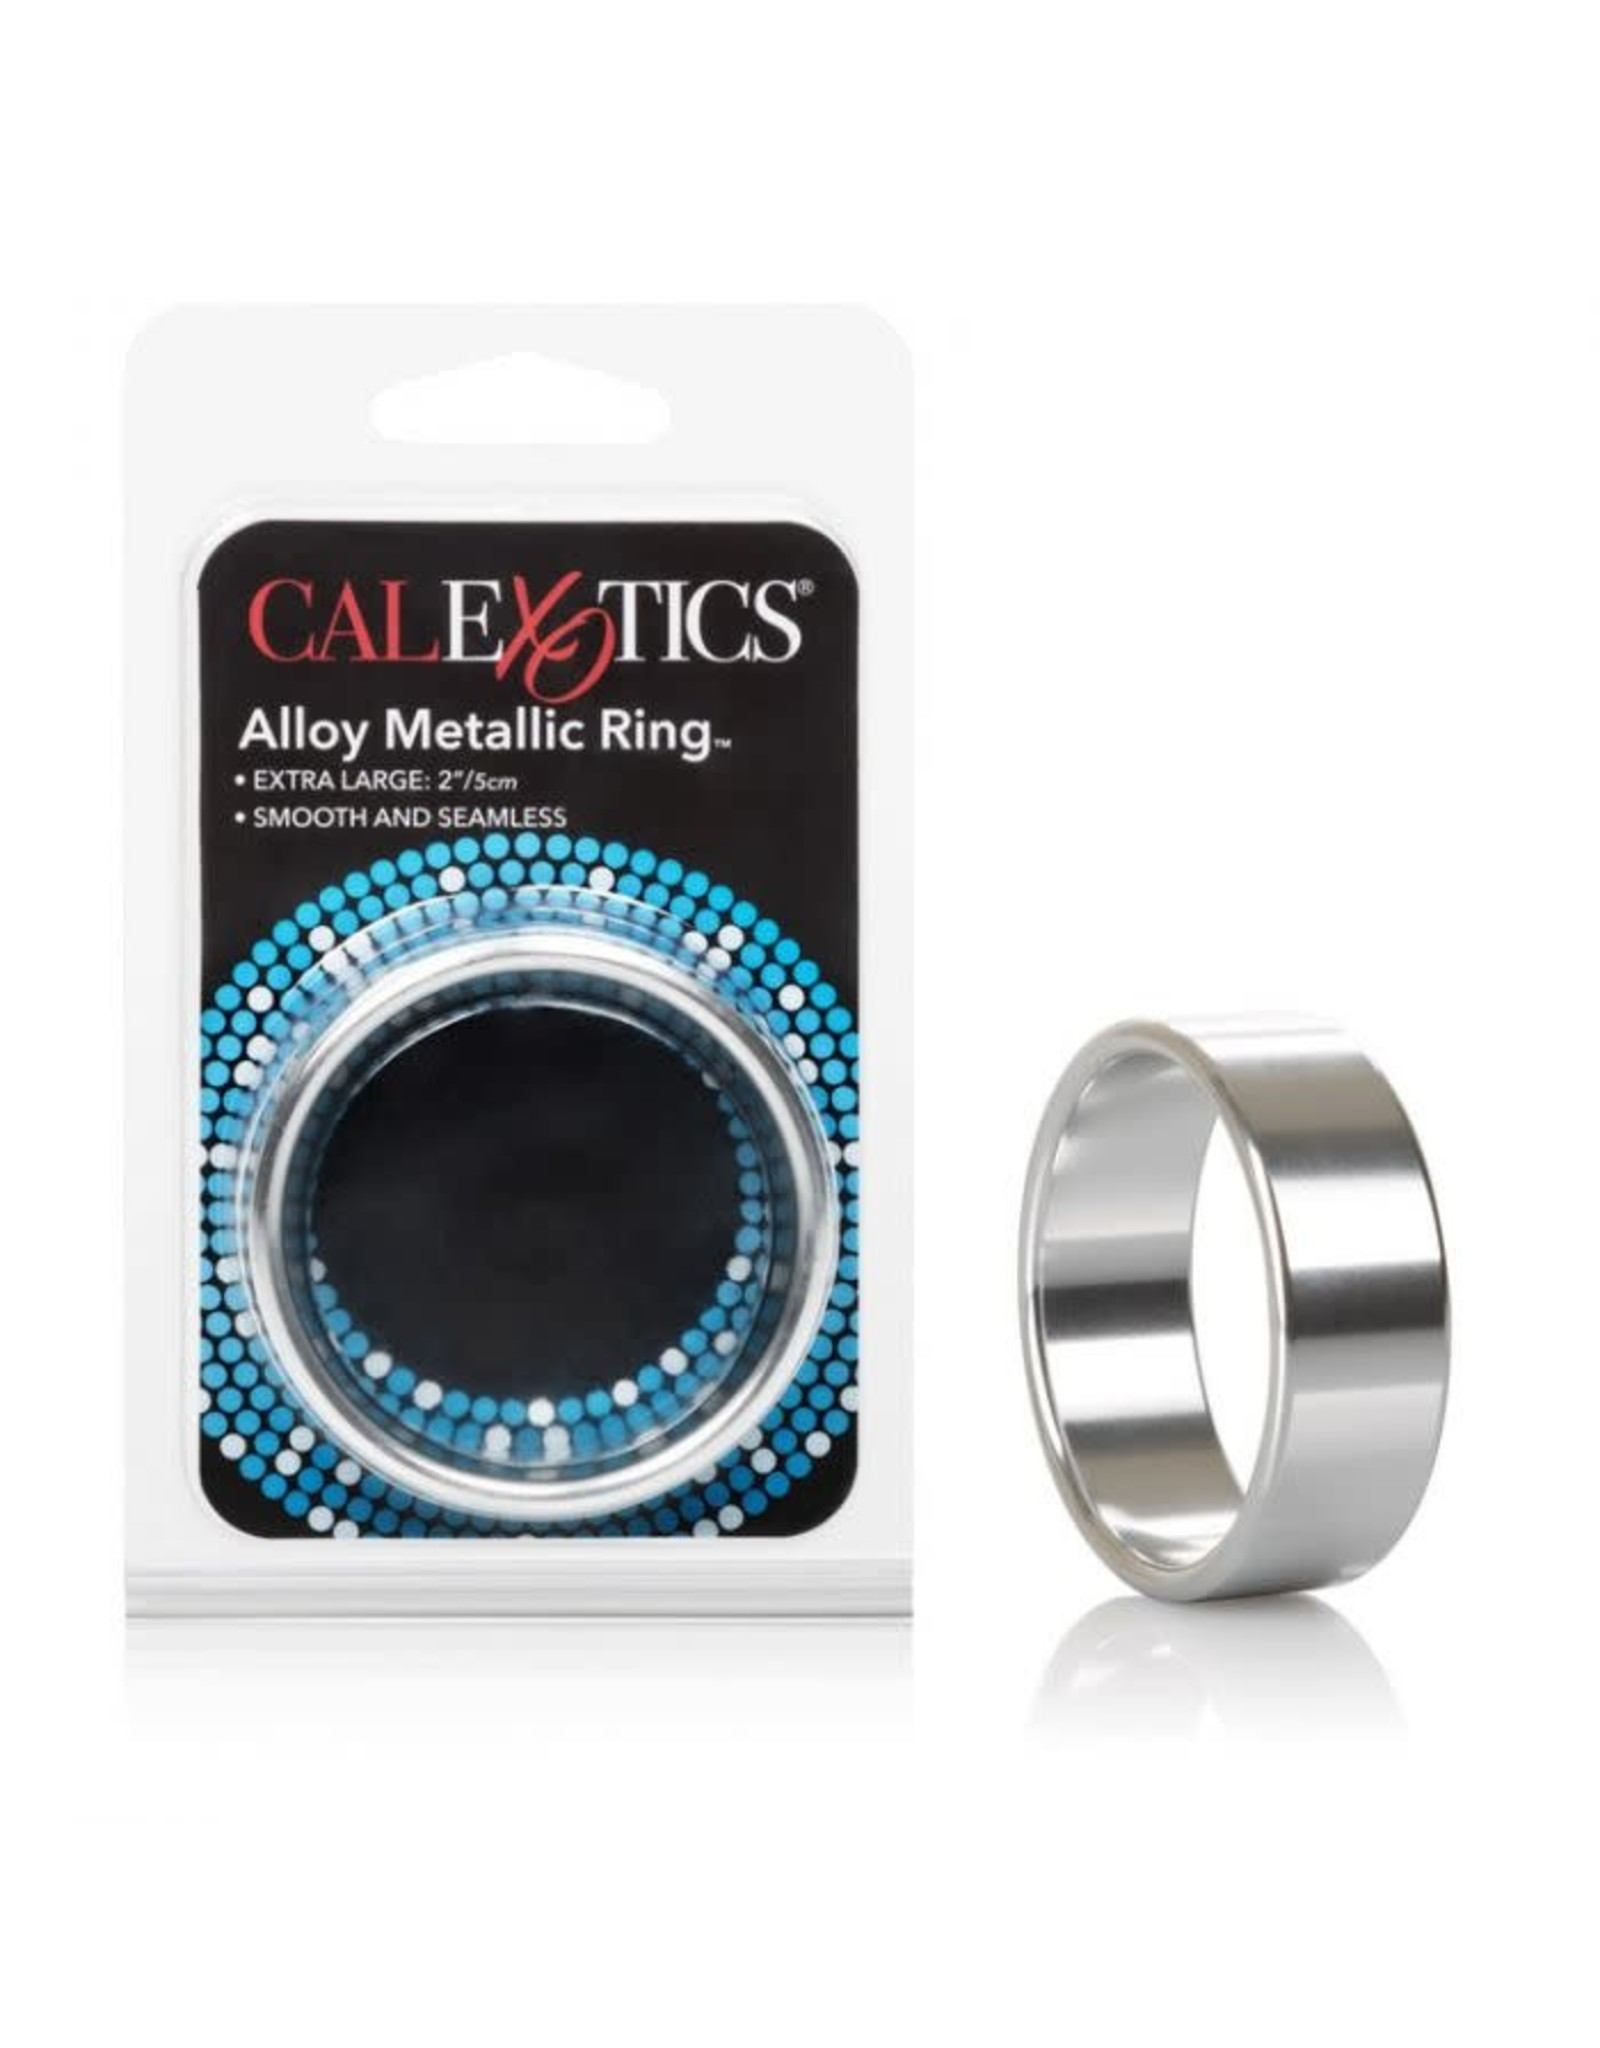 "CALEXOTICS - ALLOY METALLIC RING - XLARGE 2"""